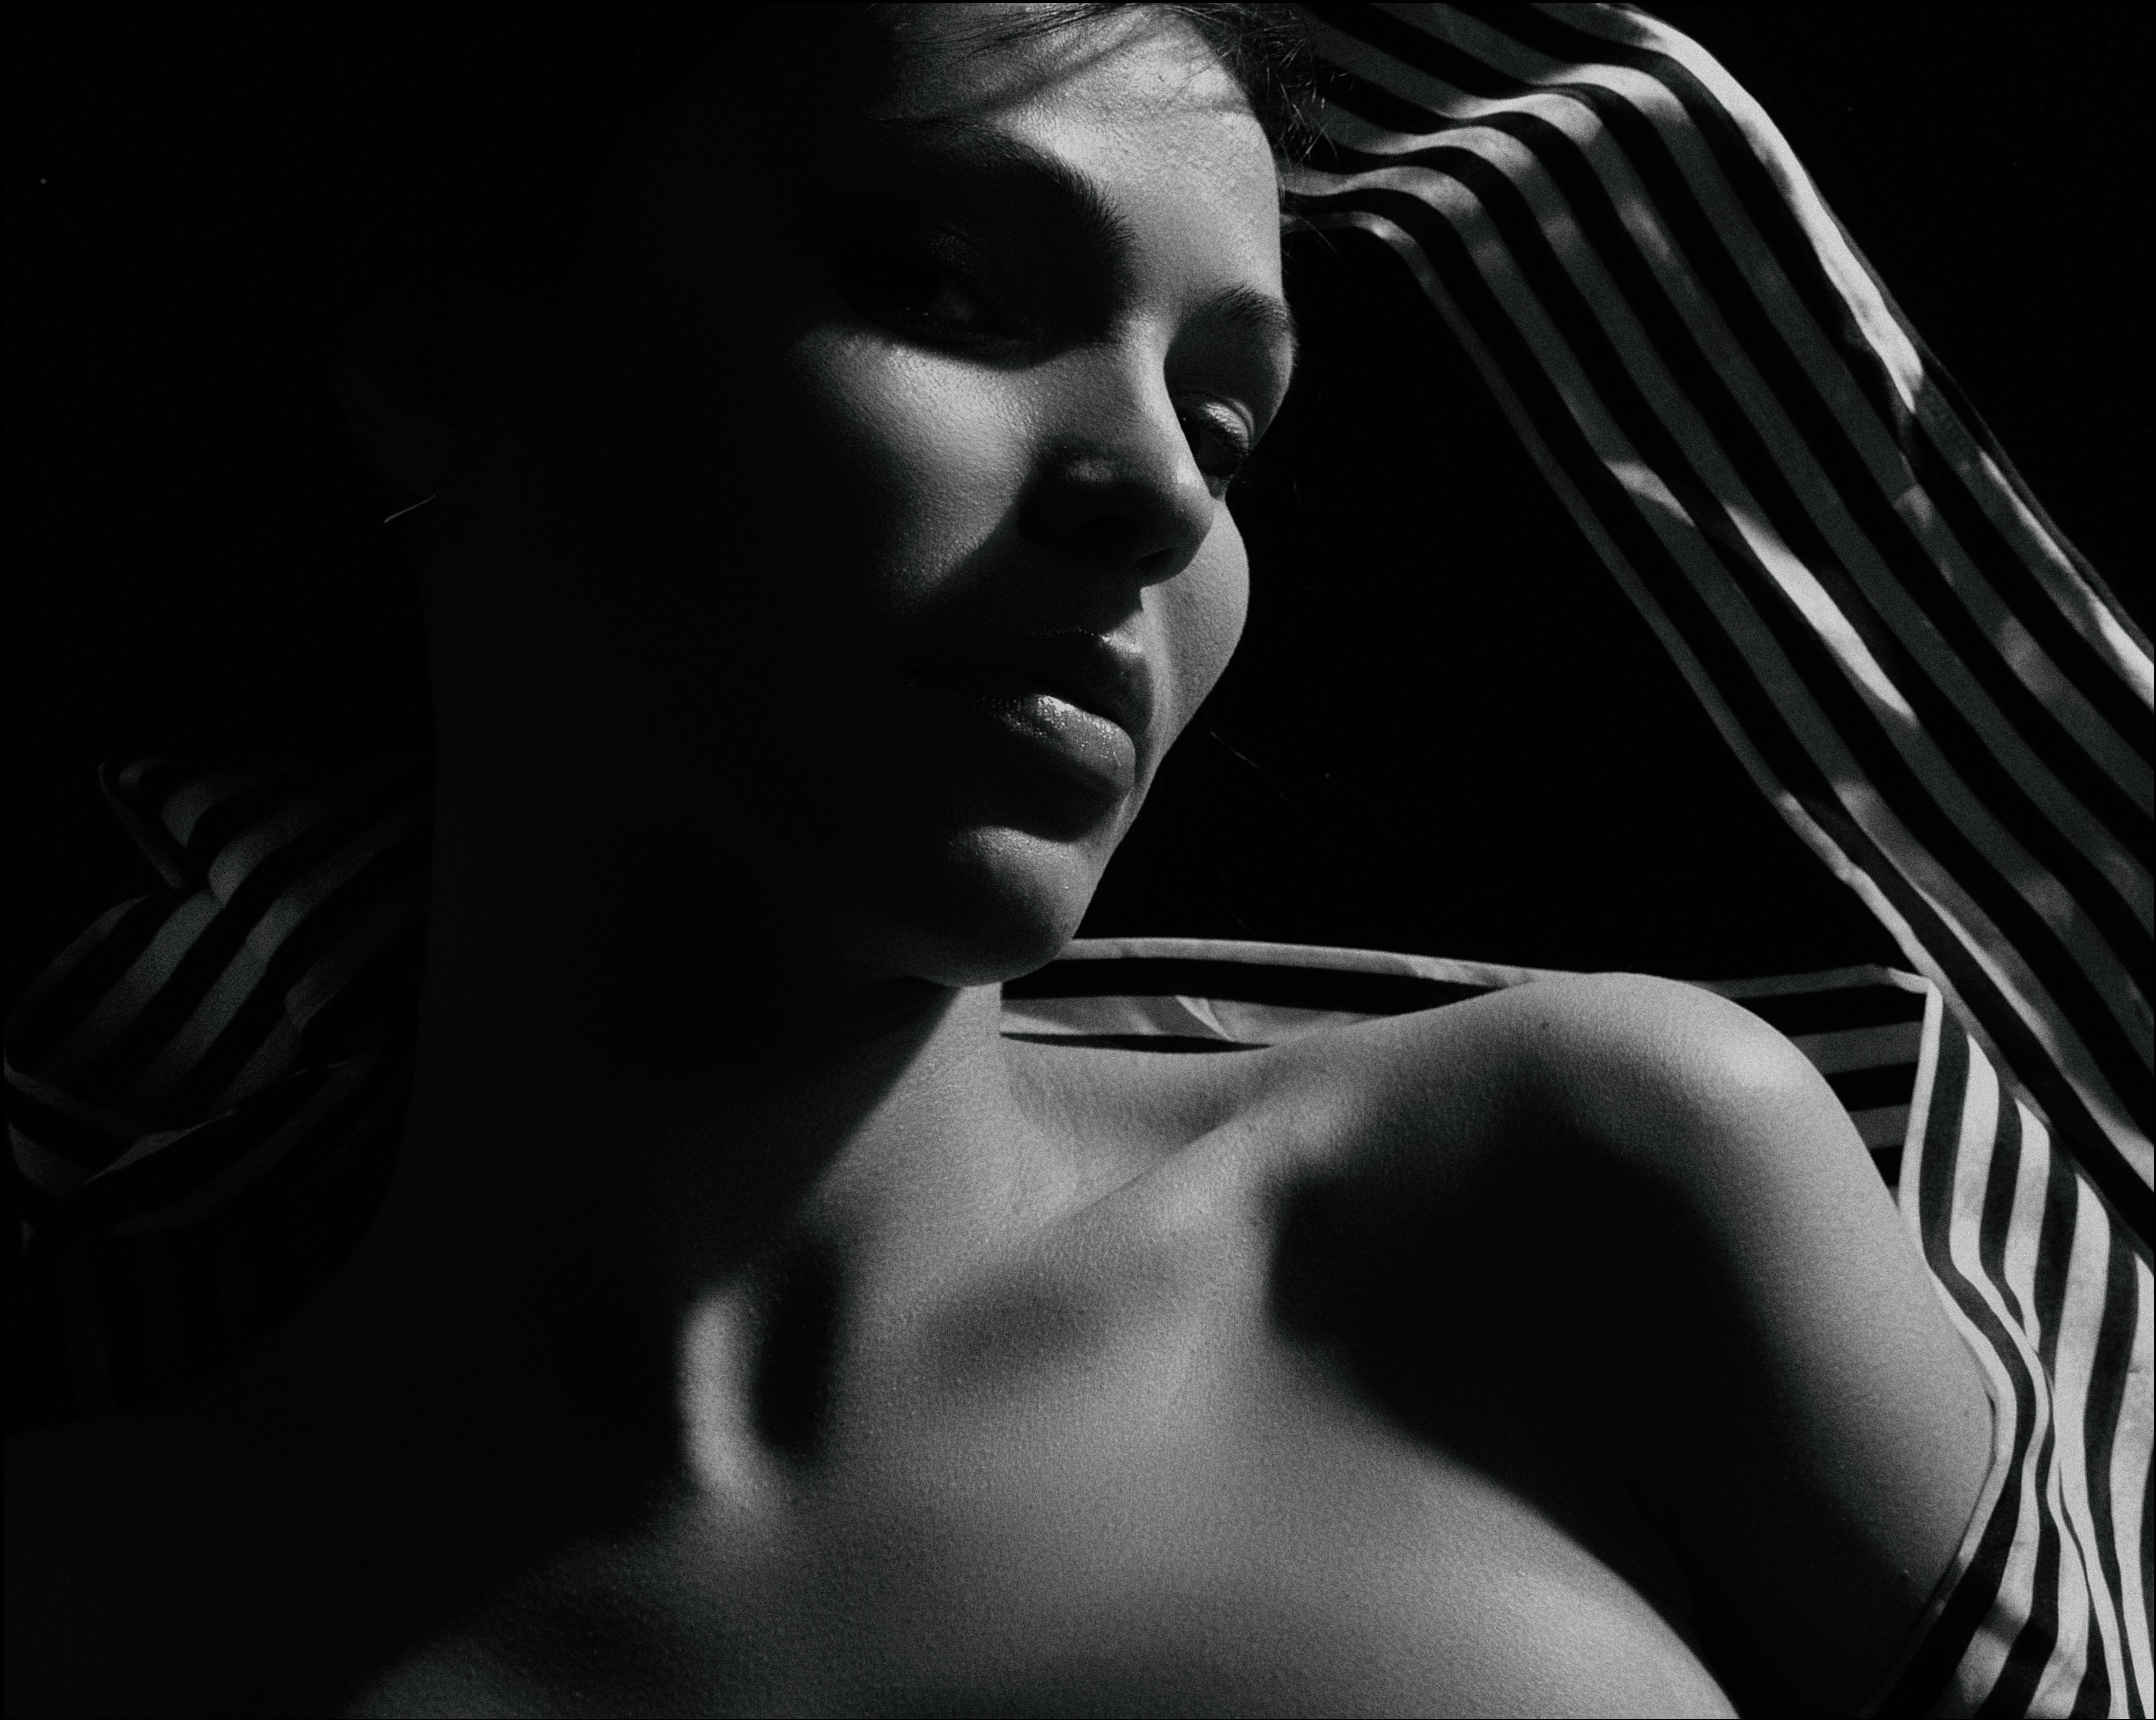 Kostnadsfri bild av erotisk, fotografering, inomhus, konst